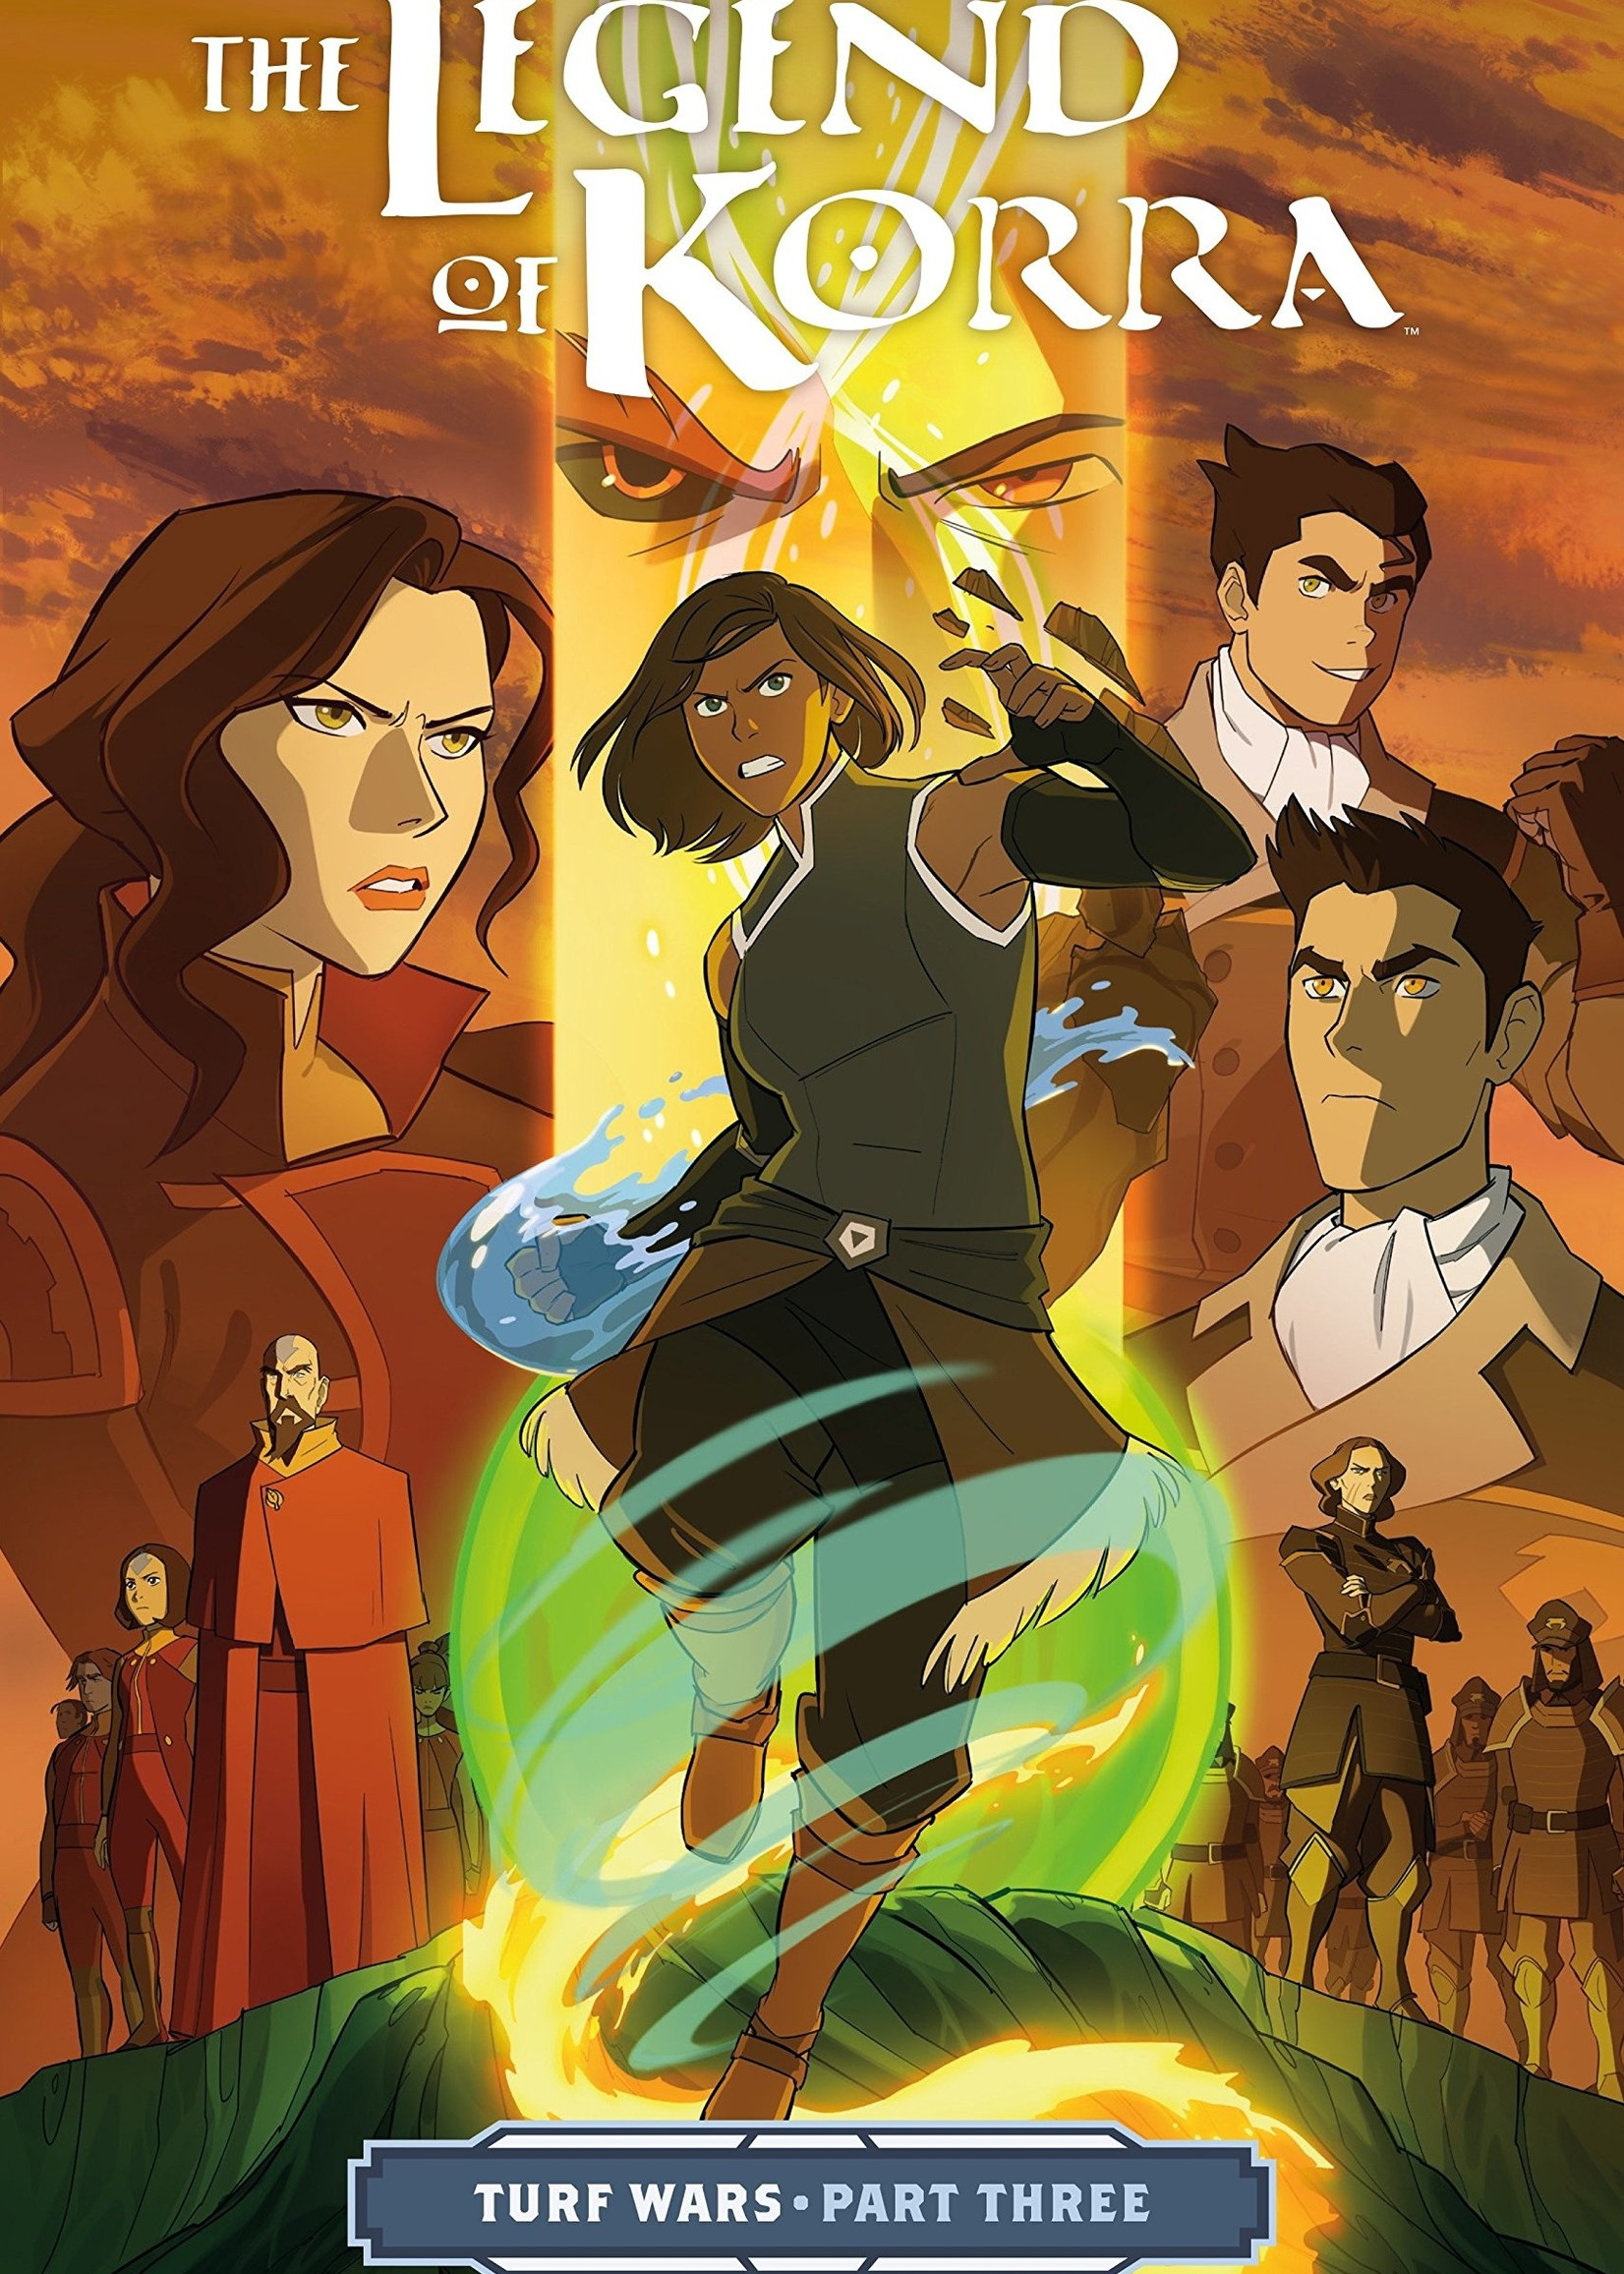 Dark Horse Comics The Legend of Korra Graphic Novel #03, Turf Wars Part 3 - Paperback